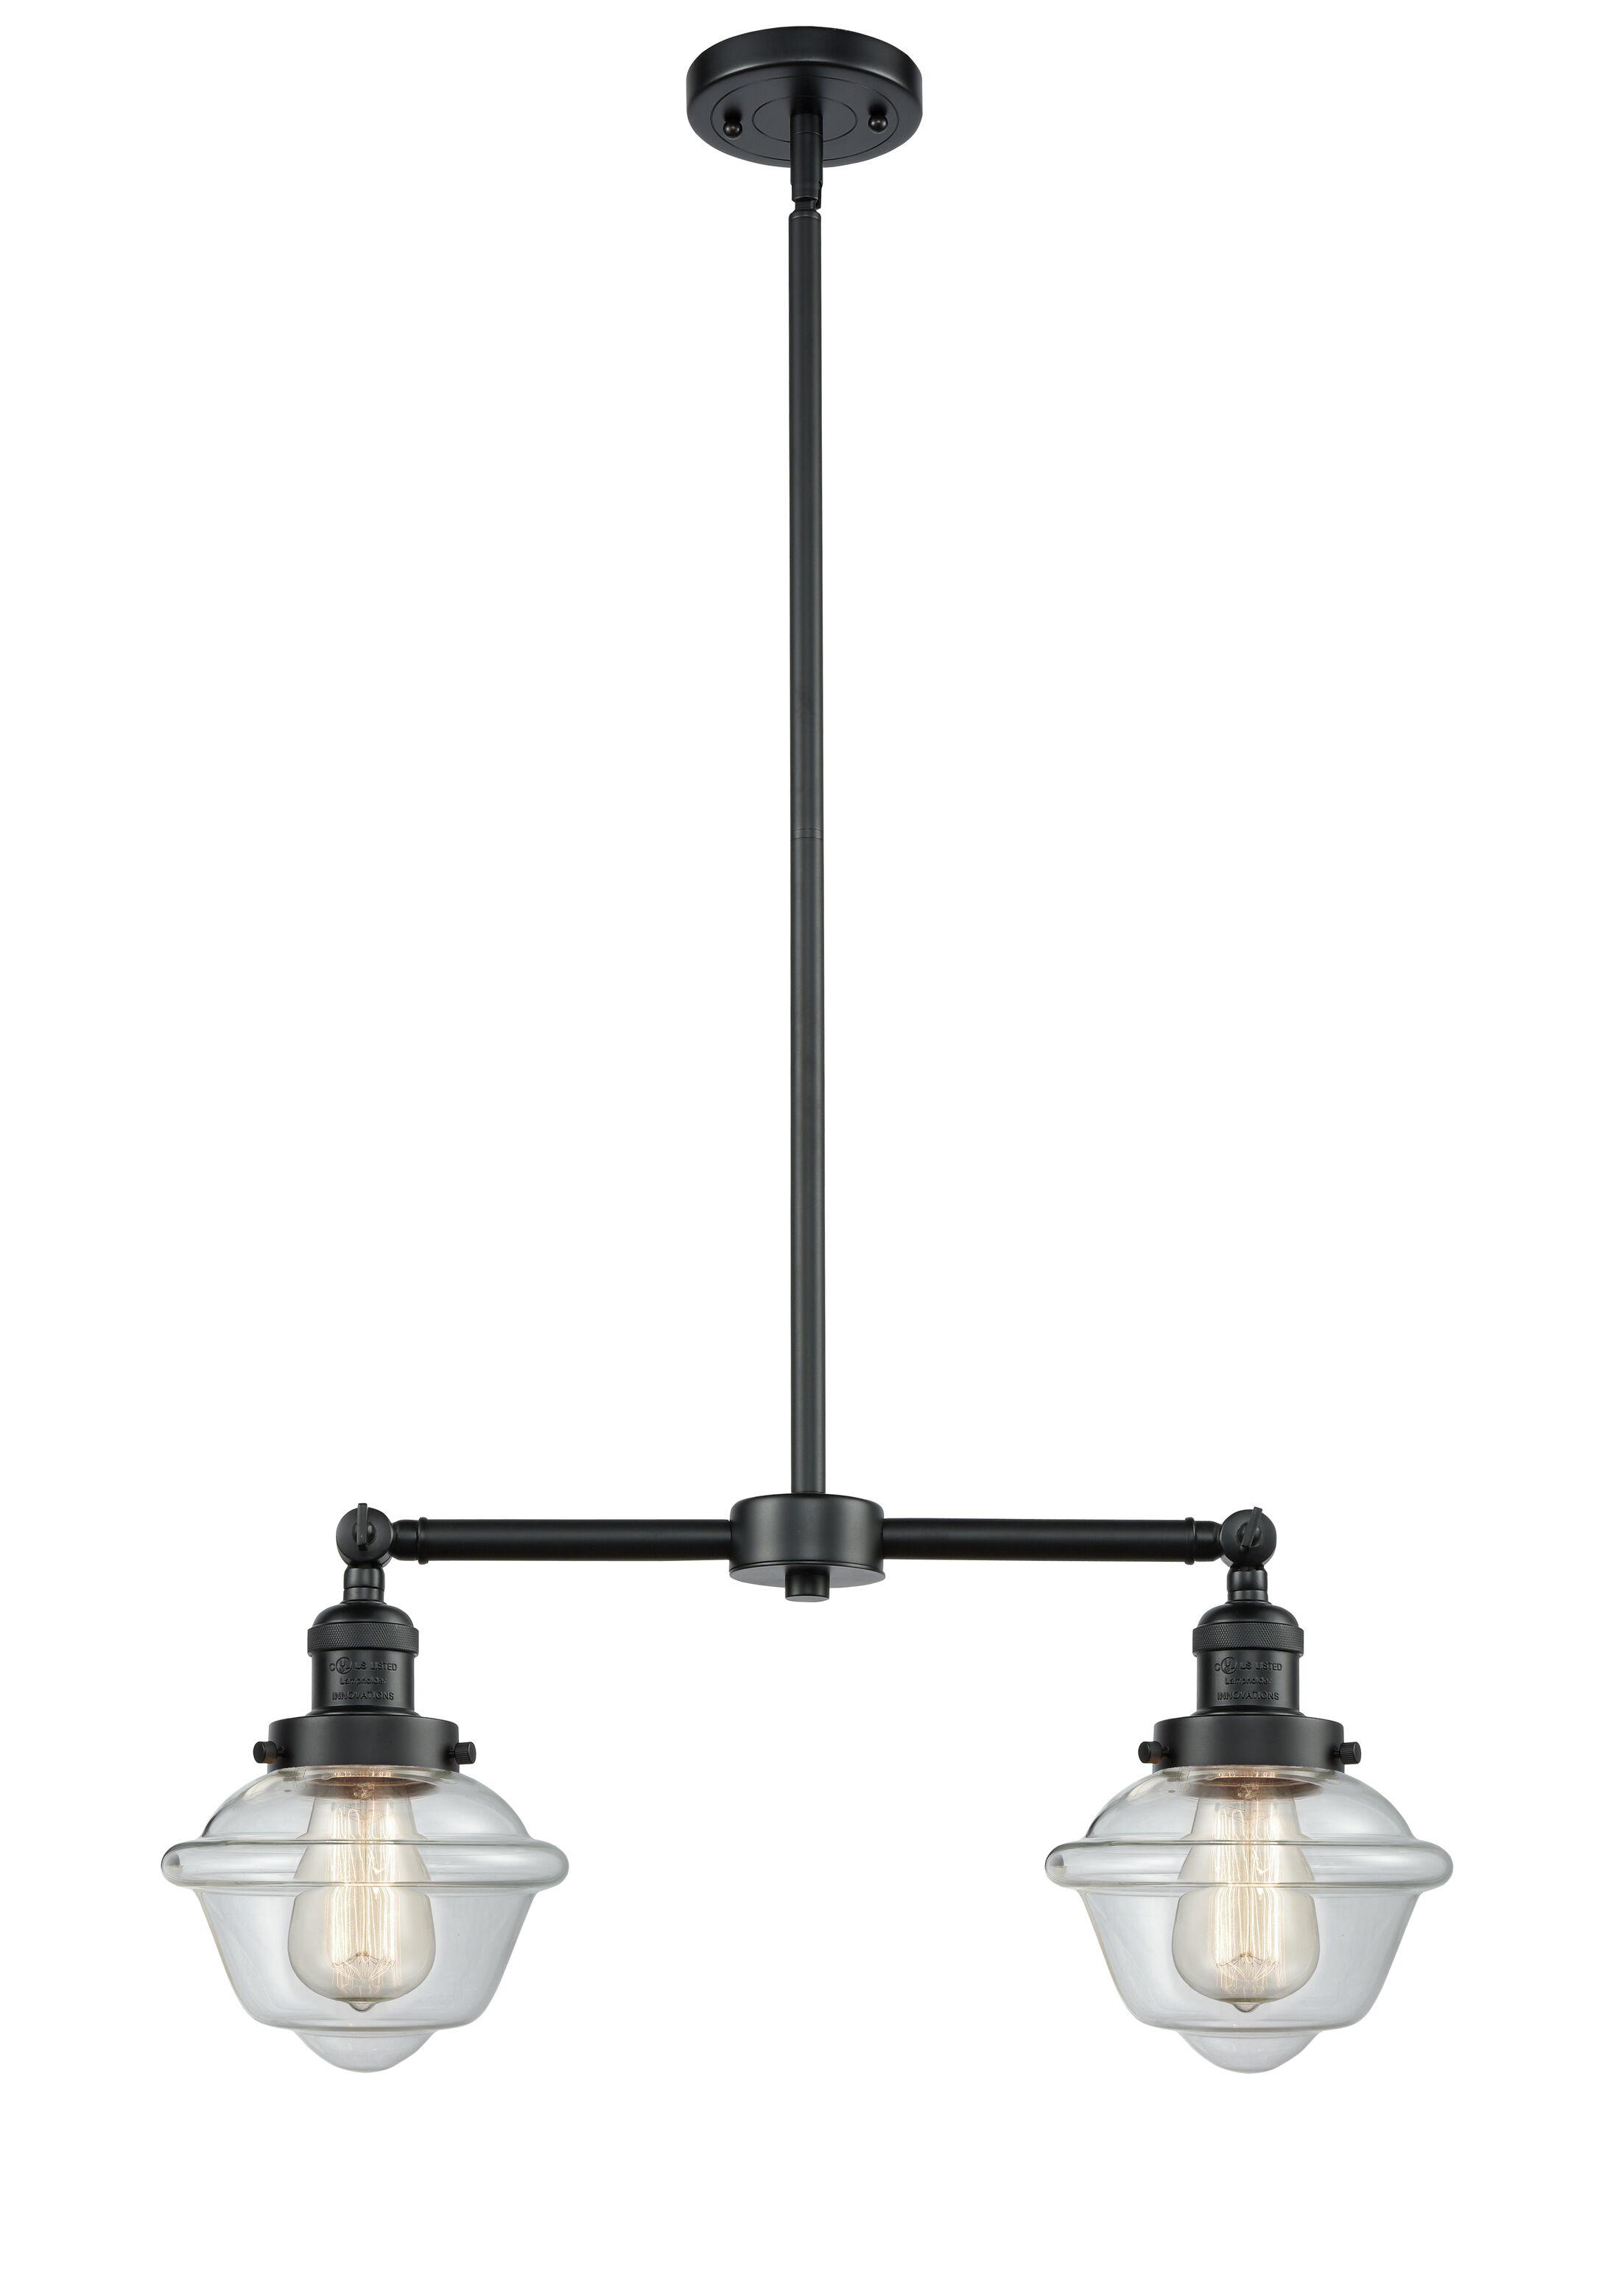 Calliope 2-Light Kitchen Island Pendant Bulb Type: Incandescent, Shade Color: Seedy, Finish: Oil Rubbed Bronze